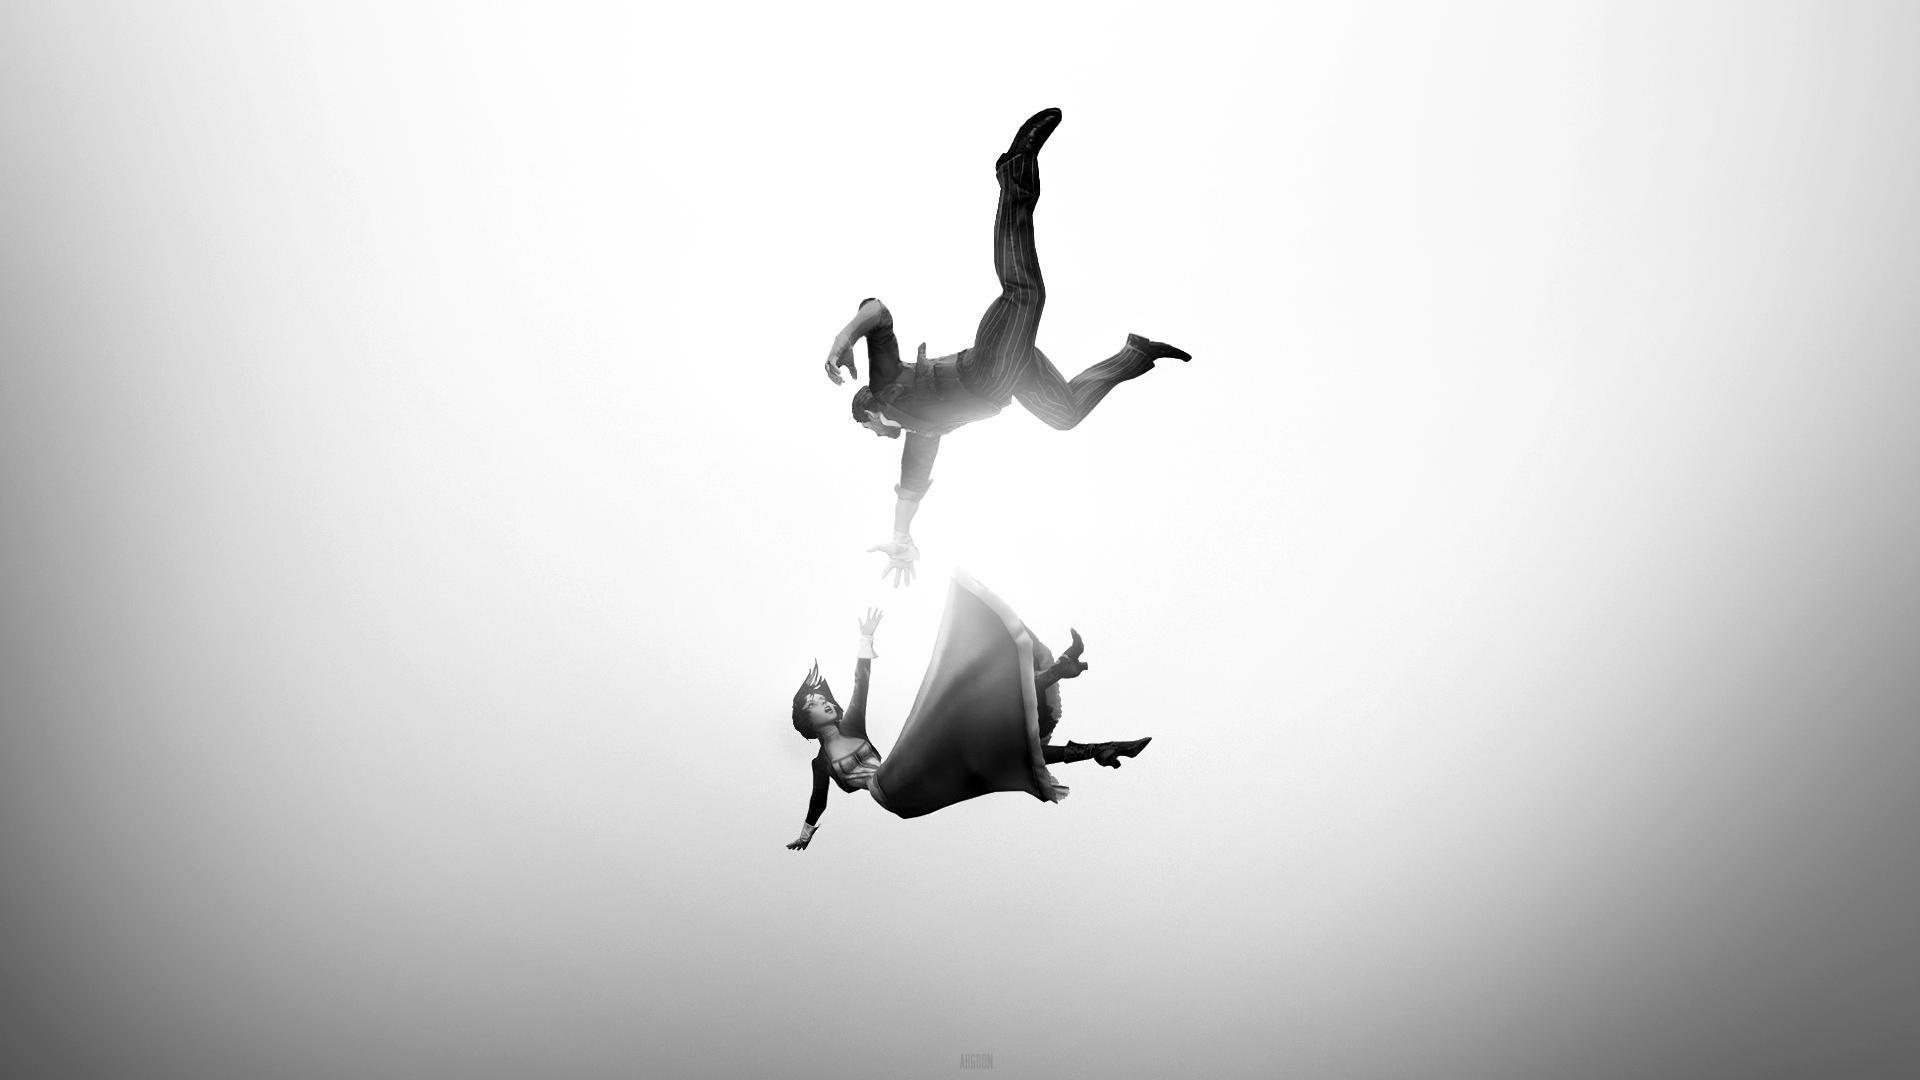 Bioshock Infinite Falling Wallpaper Hd Wallpaper Jumping Silhouette Falling Bioshock